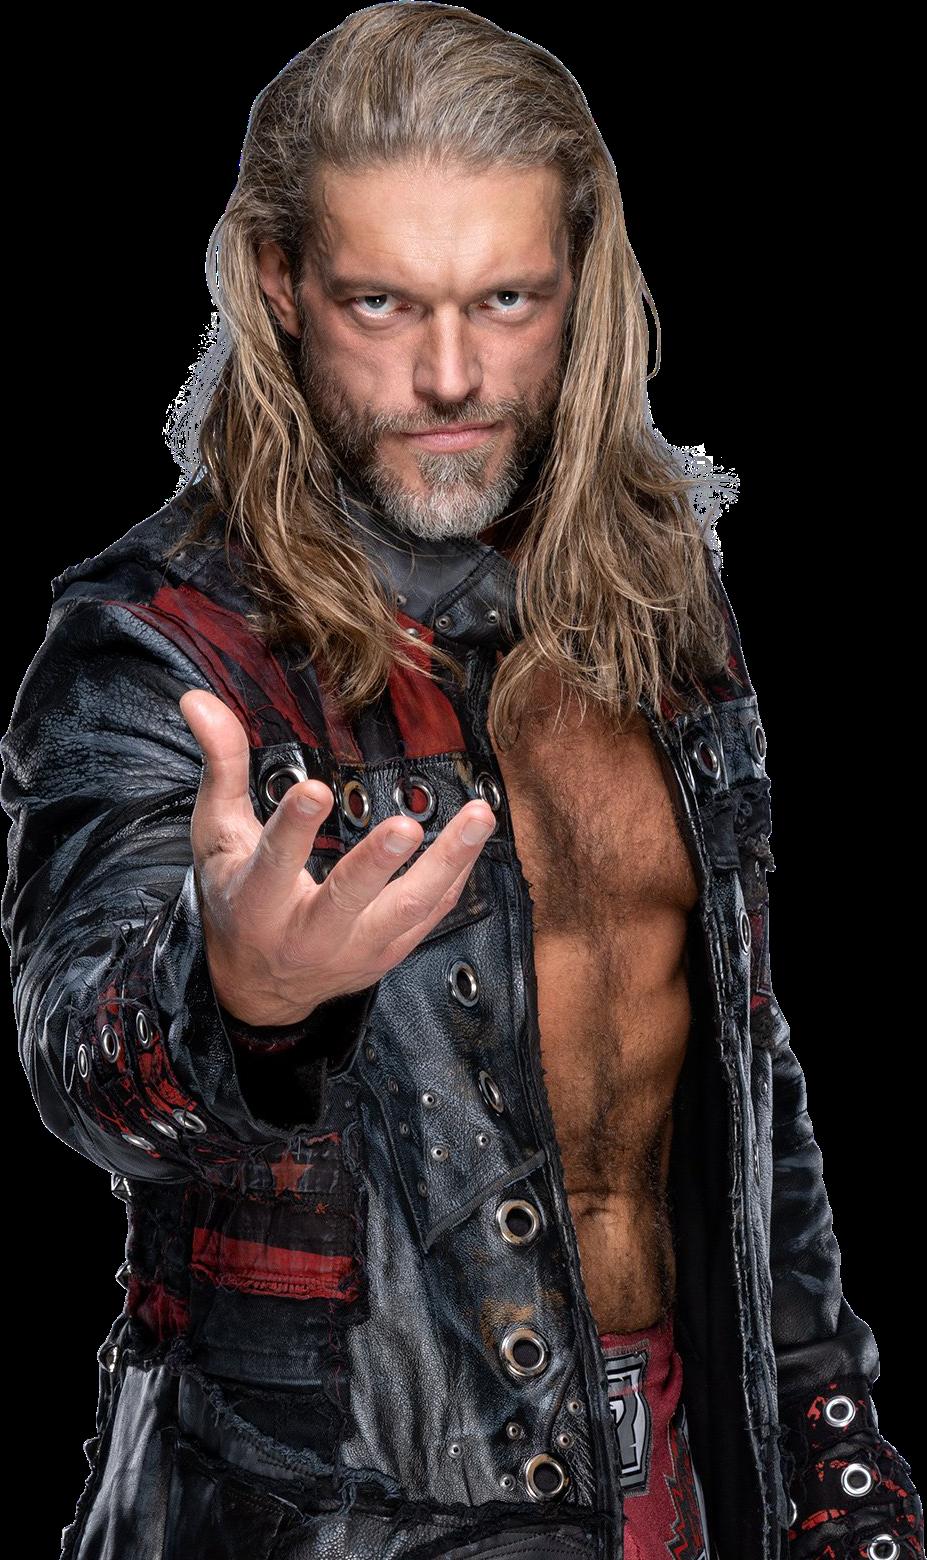 Edge New 2020 Render 2 By Takersangel936 On Deviantart Wwe Edge Wwe Royal Rumble Royal Rumble